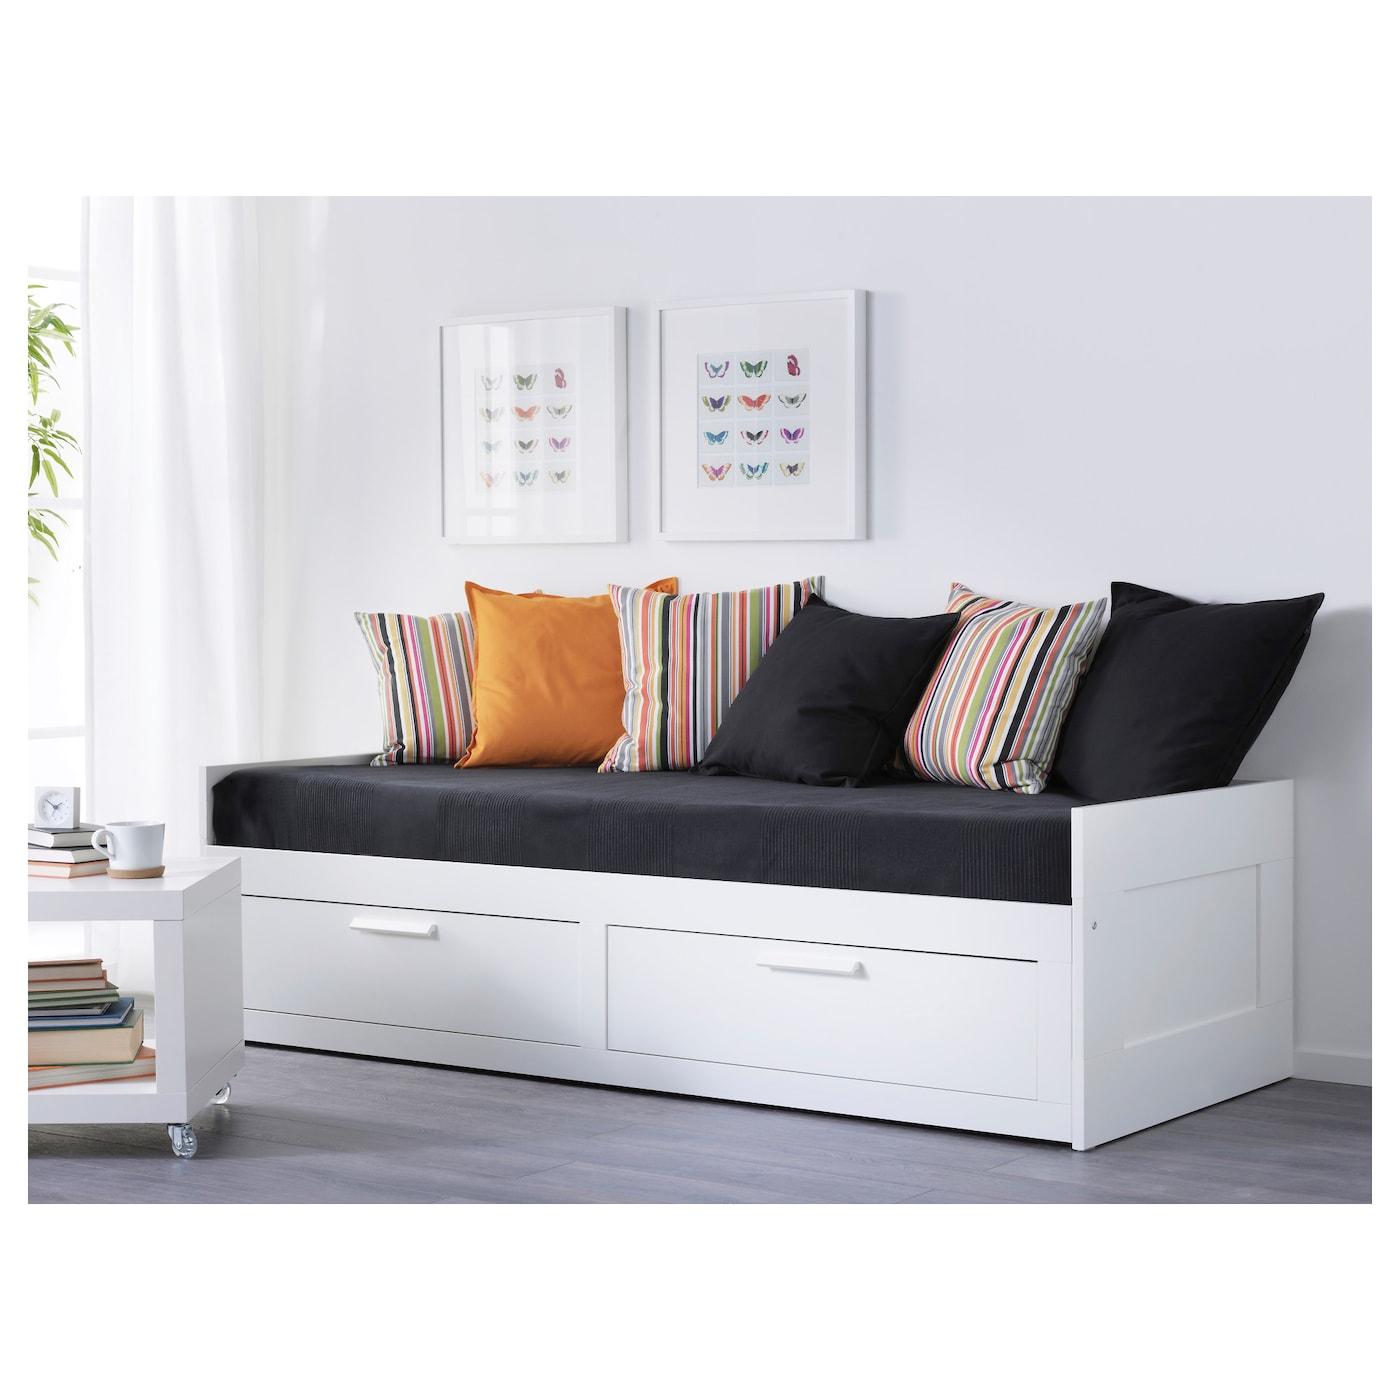 brimnes day bed frame with 2 drawers white 80 x 200 cm ikea. Black Bedroom Furniture Sets. Home Design Ideas